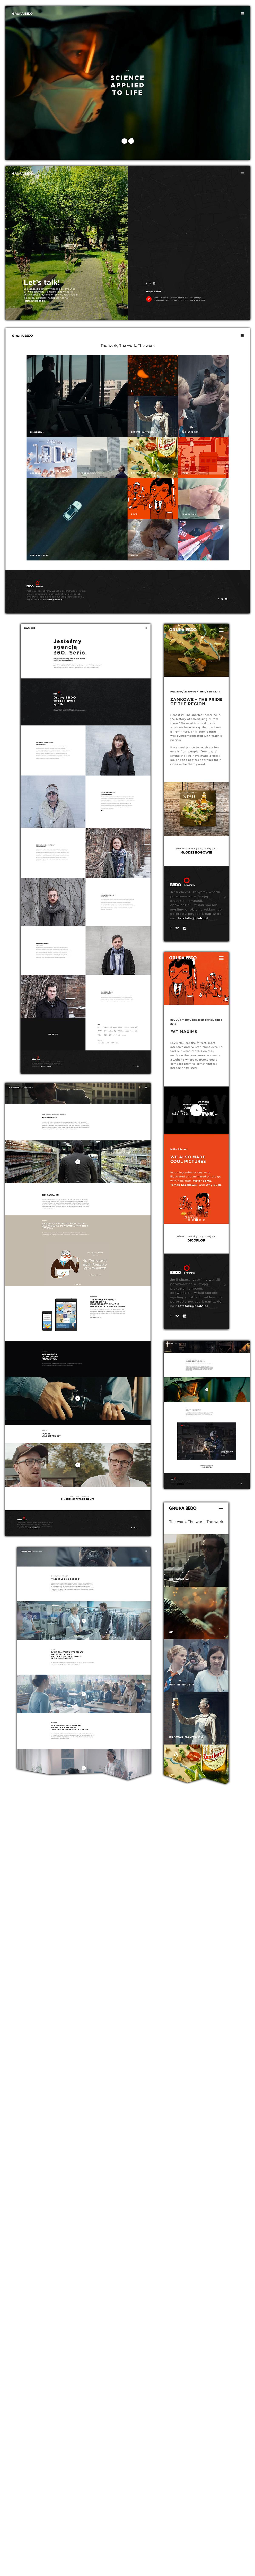 HTML css web animation Agencies